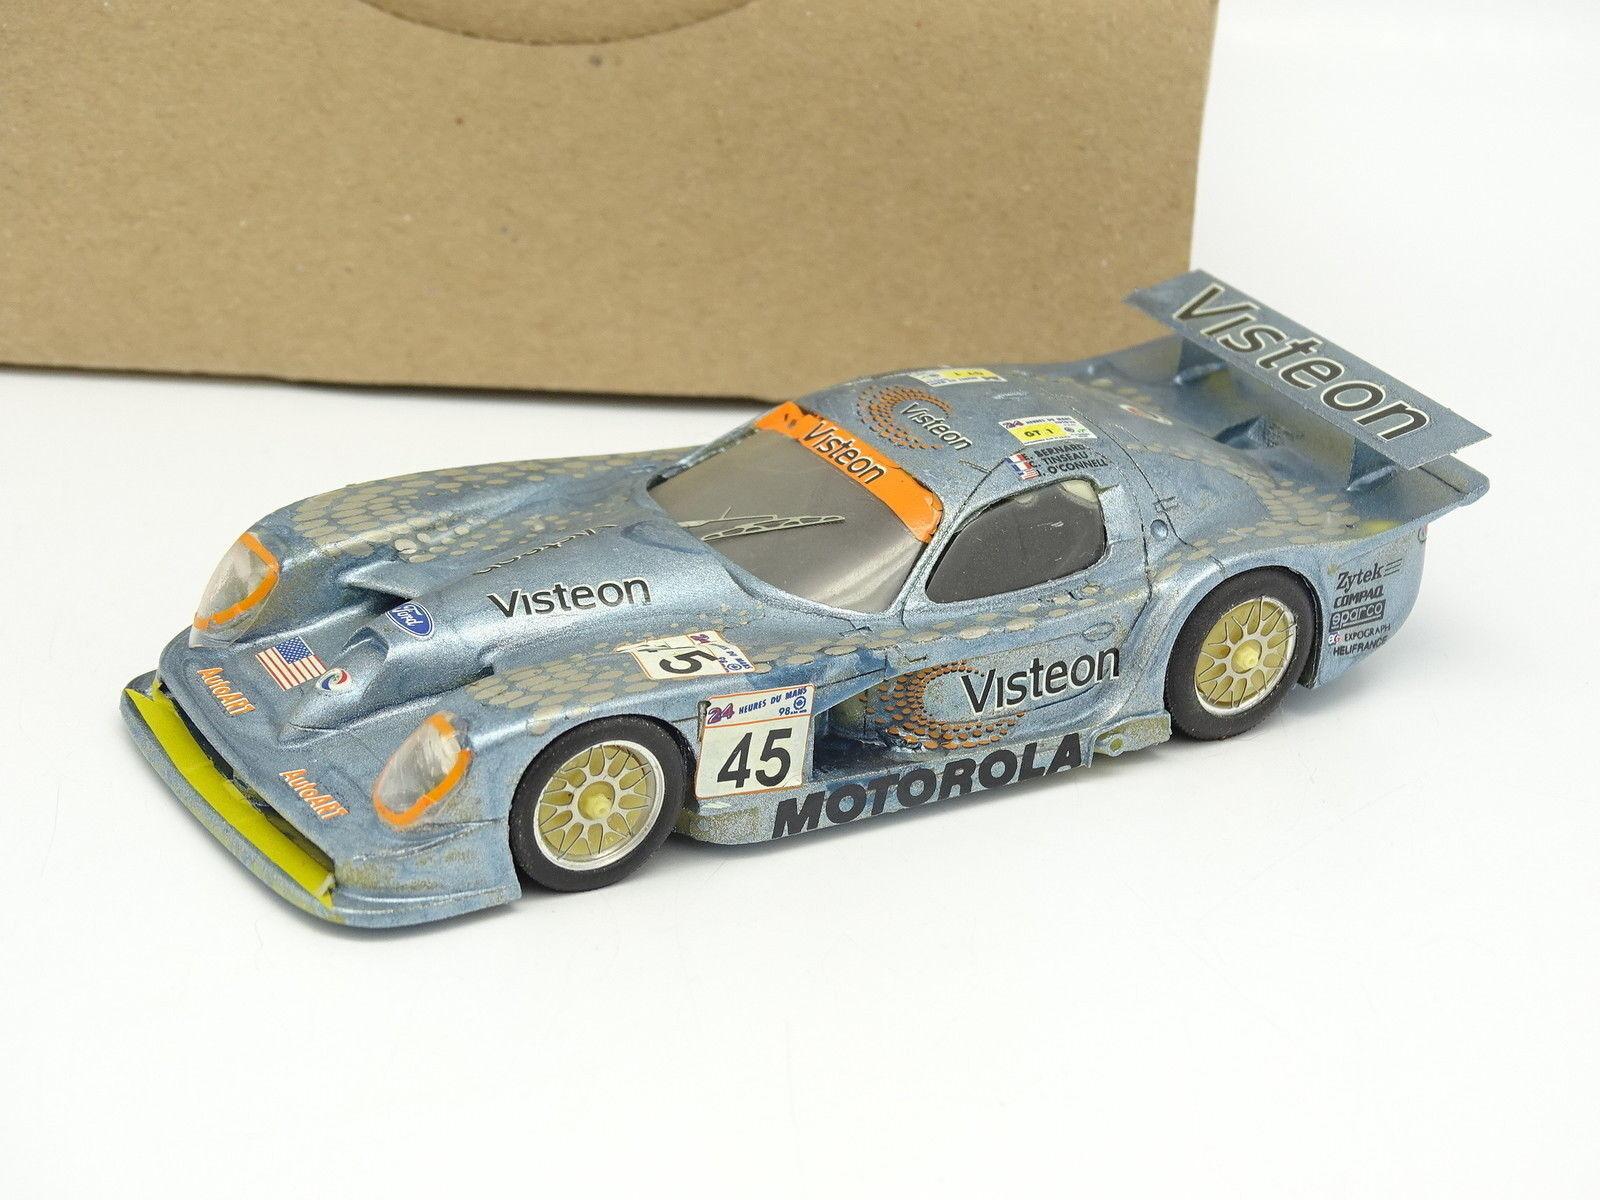 Provence Moulding Kit Assembled SB 1 43 - PANOZ GTR 1 No.45 LE MANS 1998